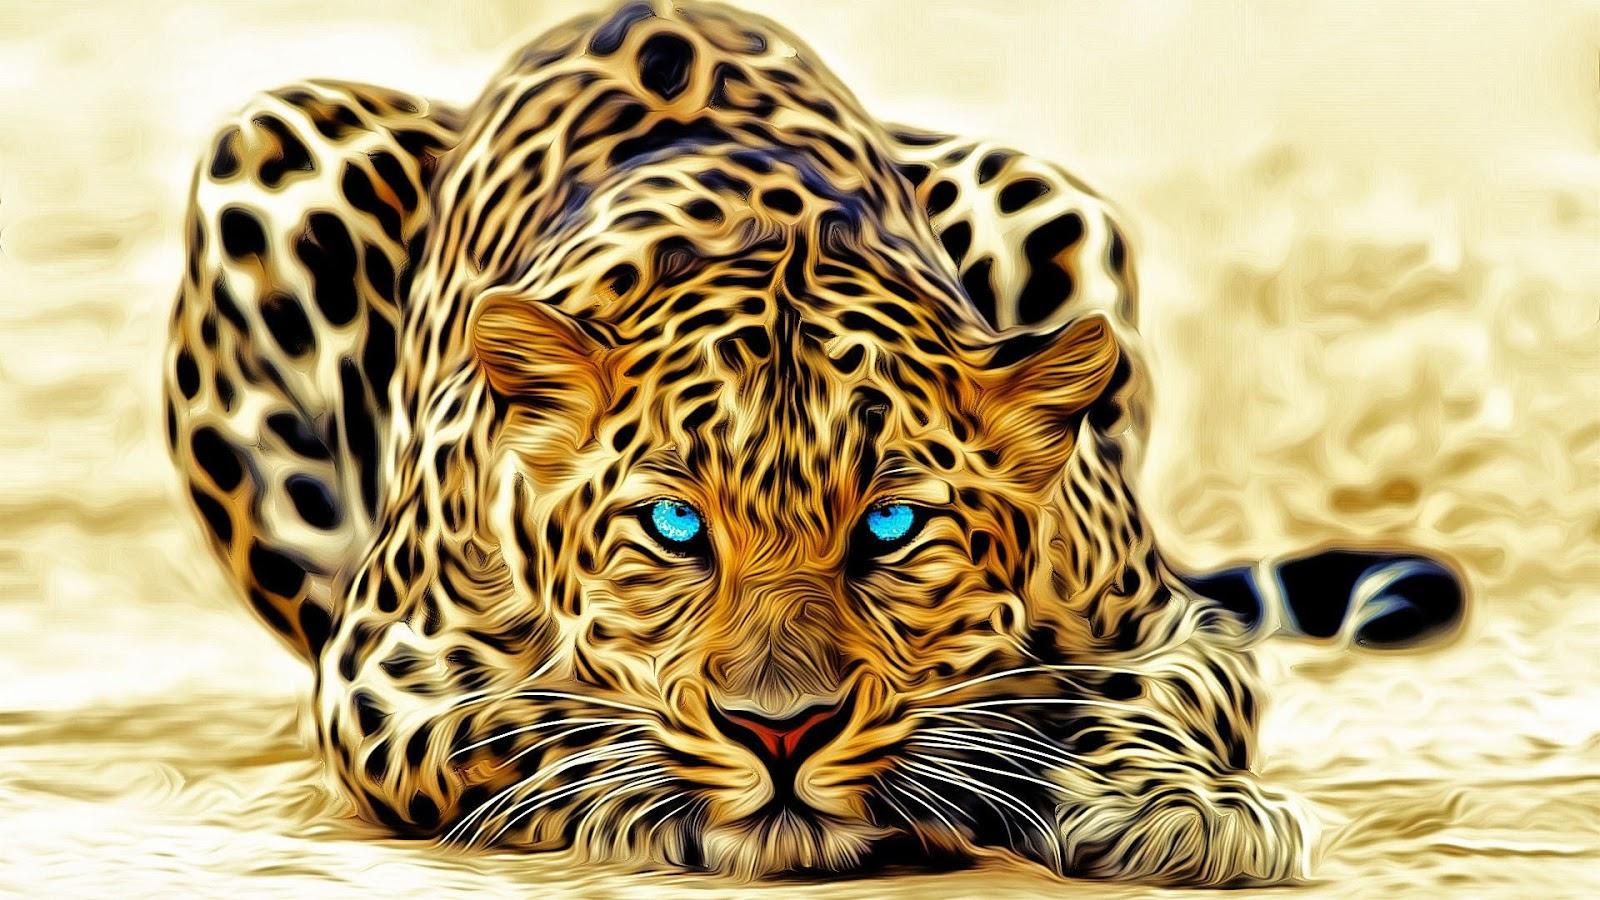 Fantasy wildlife abstract animal creative design art hd for Wild design